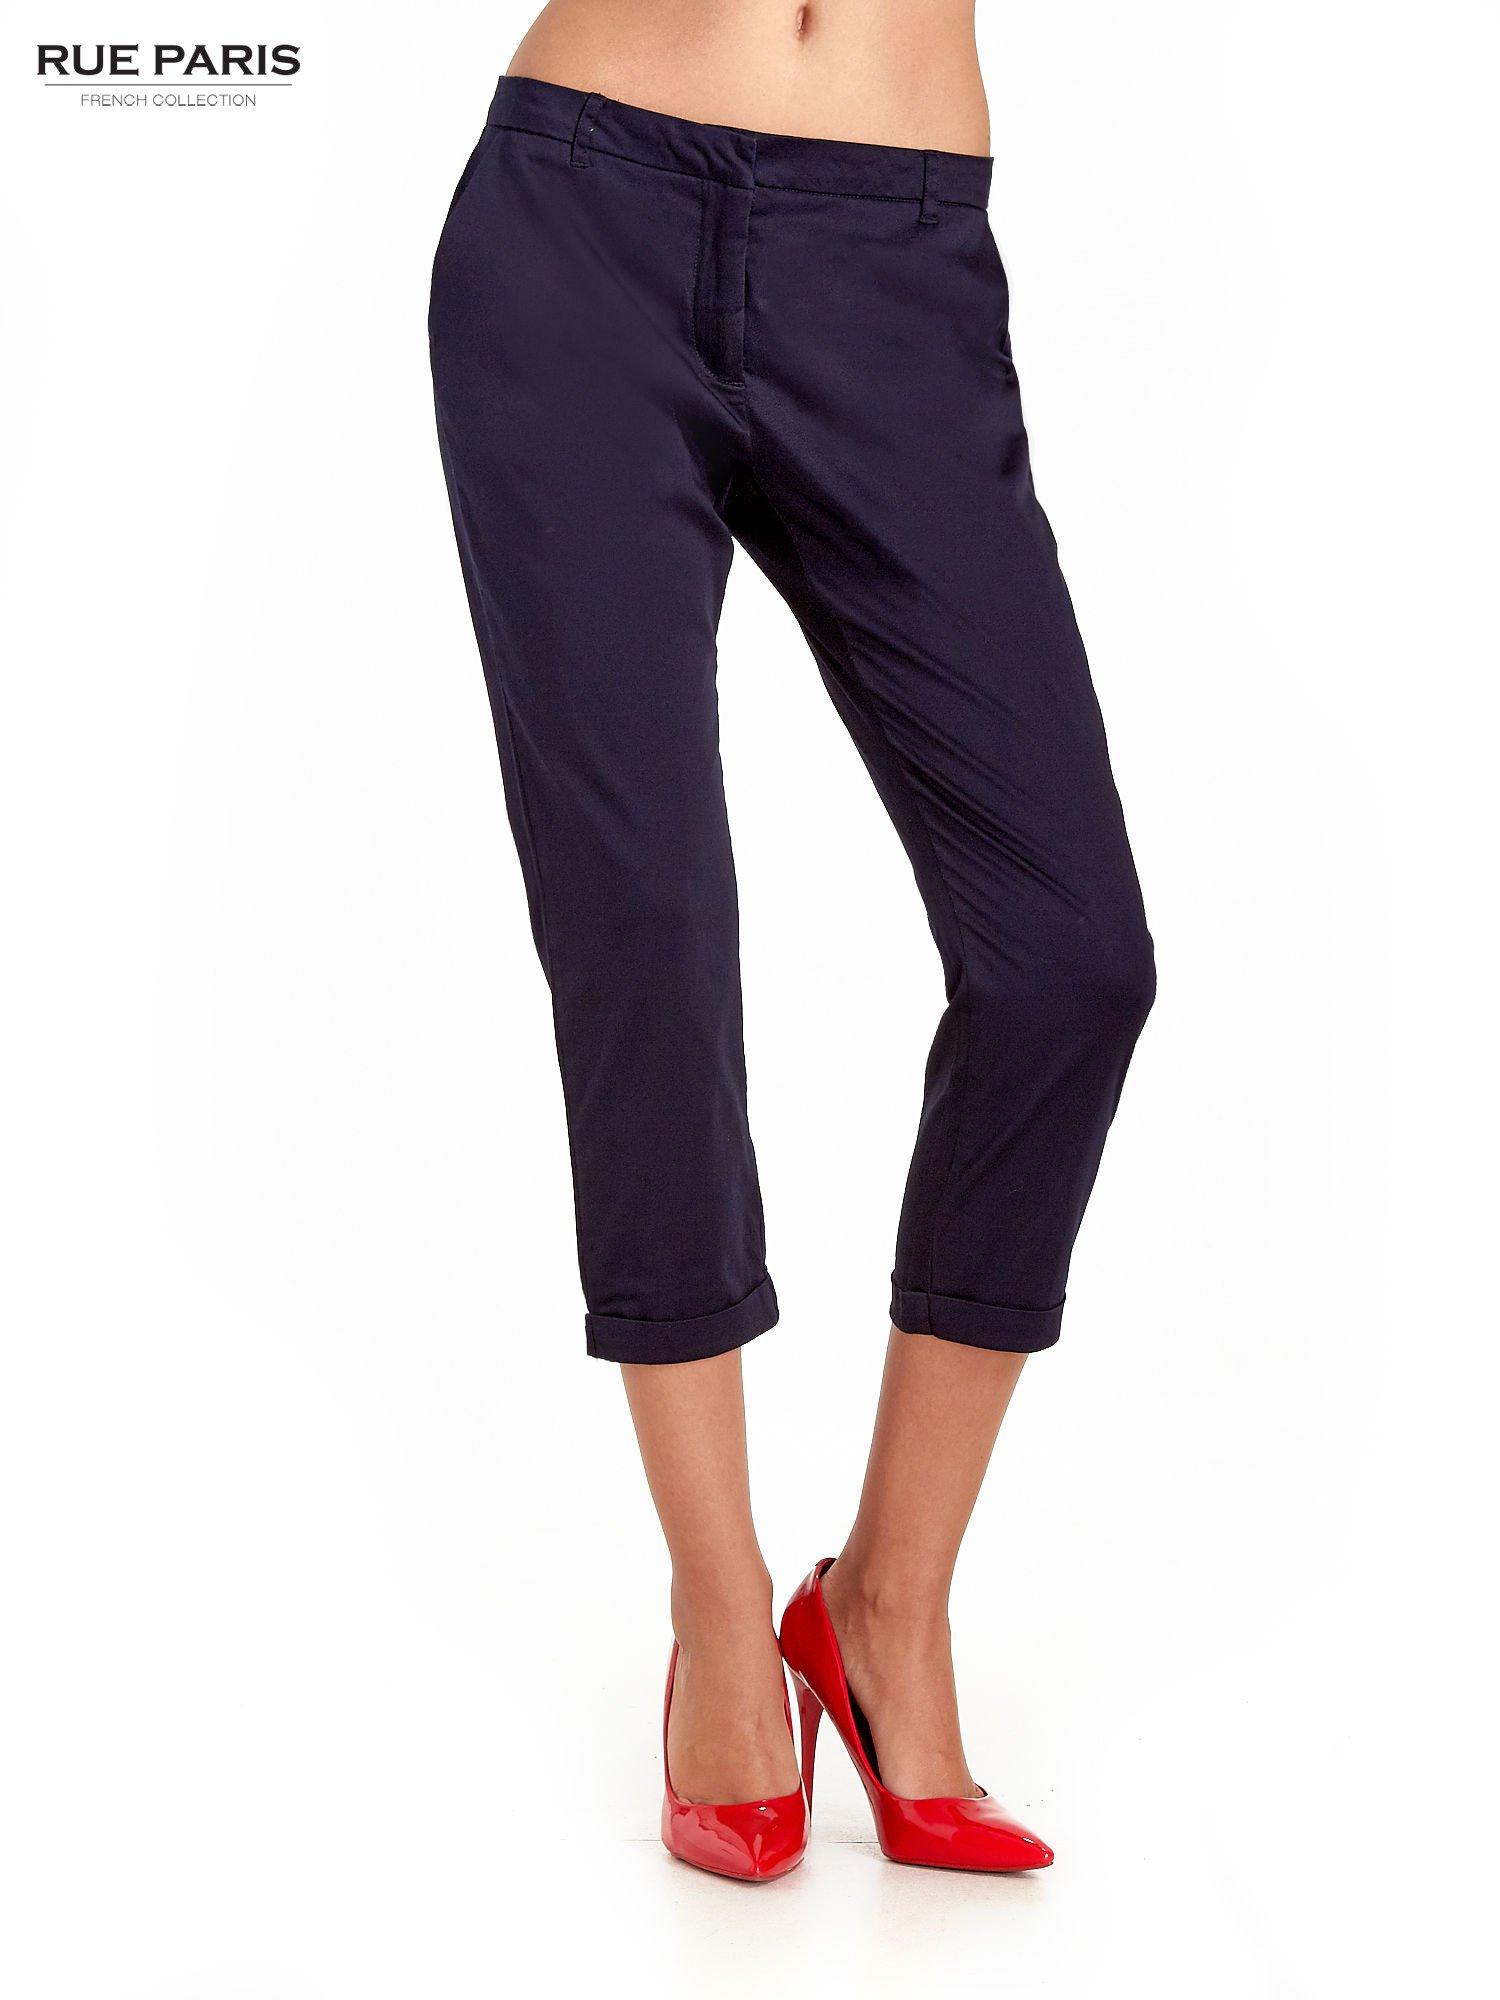 Granatowe eleganckie spodnie za kolano                                  zdj.                                  1